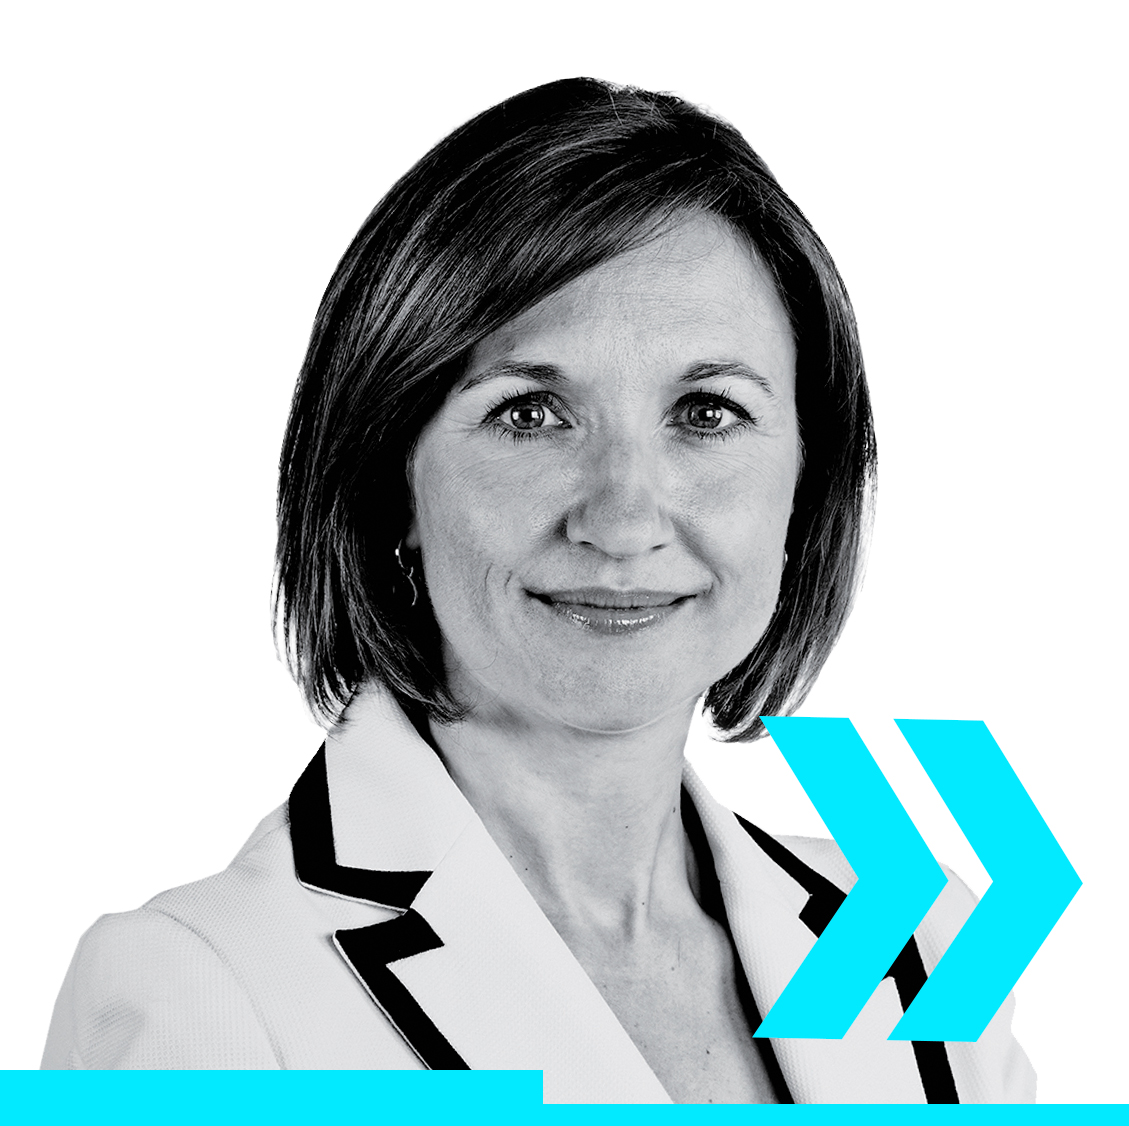 Emmanuelle Muller Schrapp